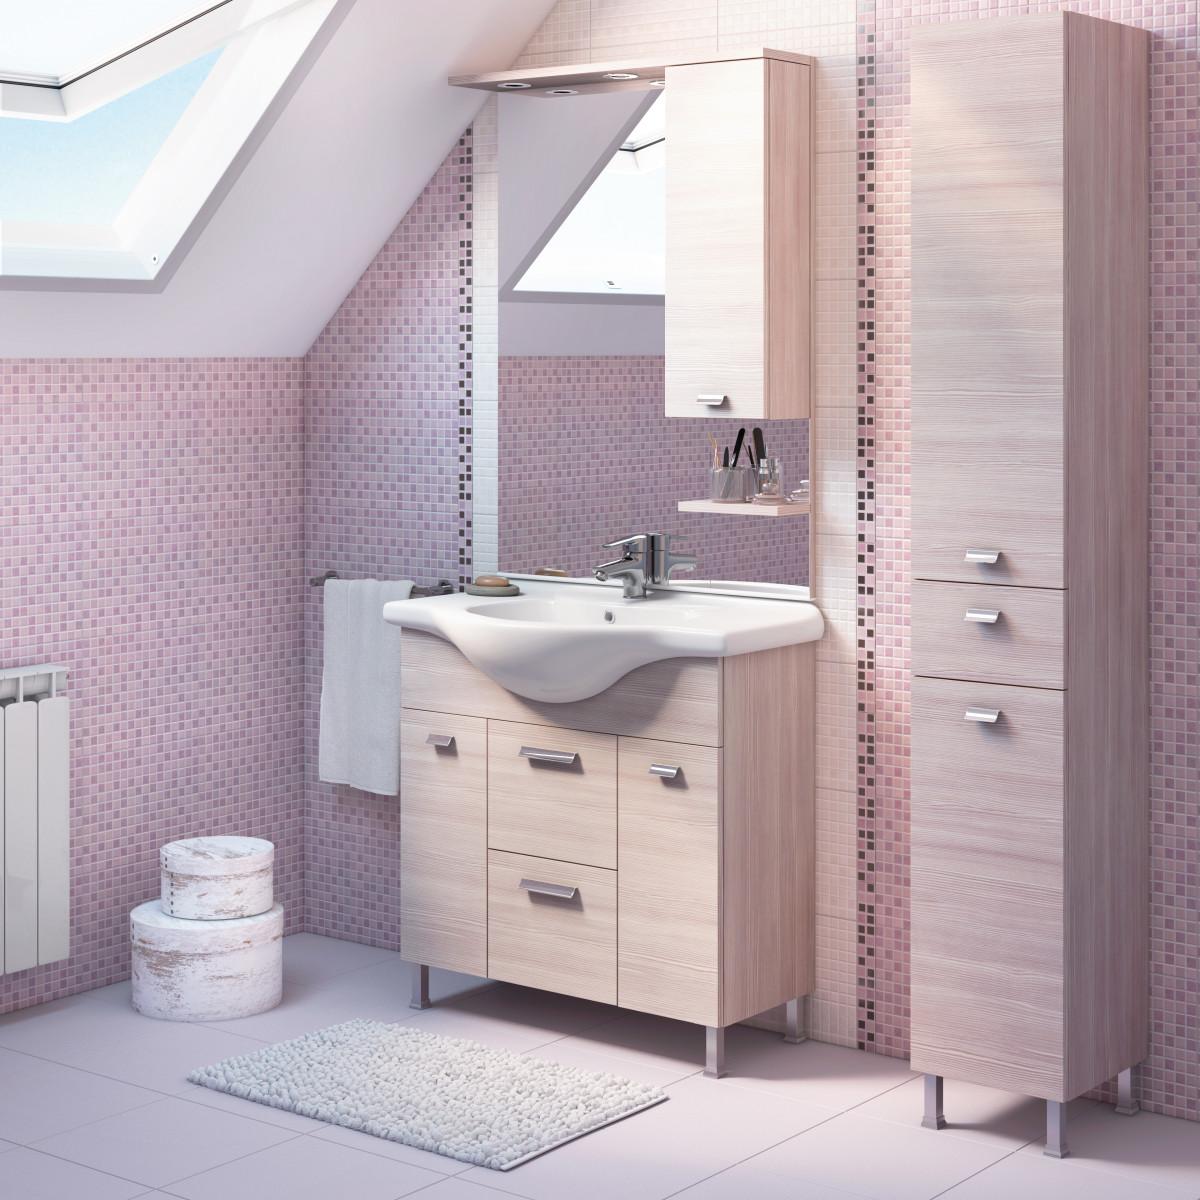 Mobile bagno rimini larice l 85 cm prezzi e offerte online - Leroy merlin rubinetti bagno ...